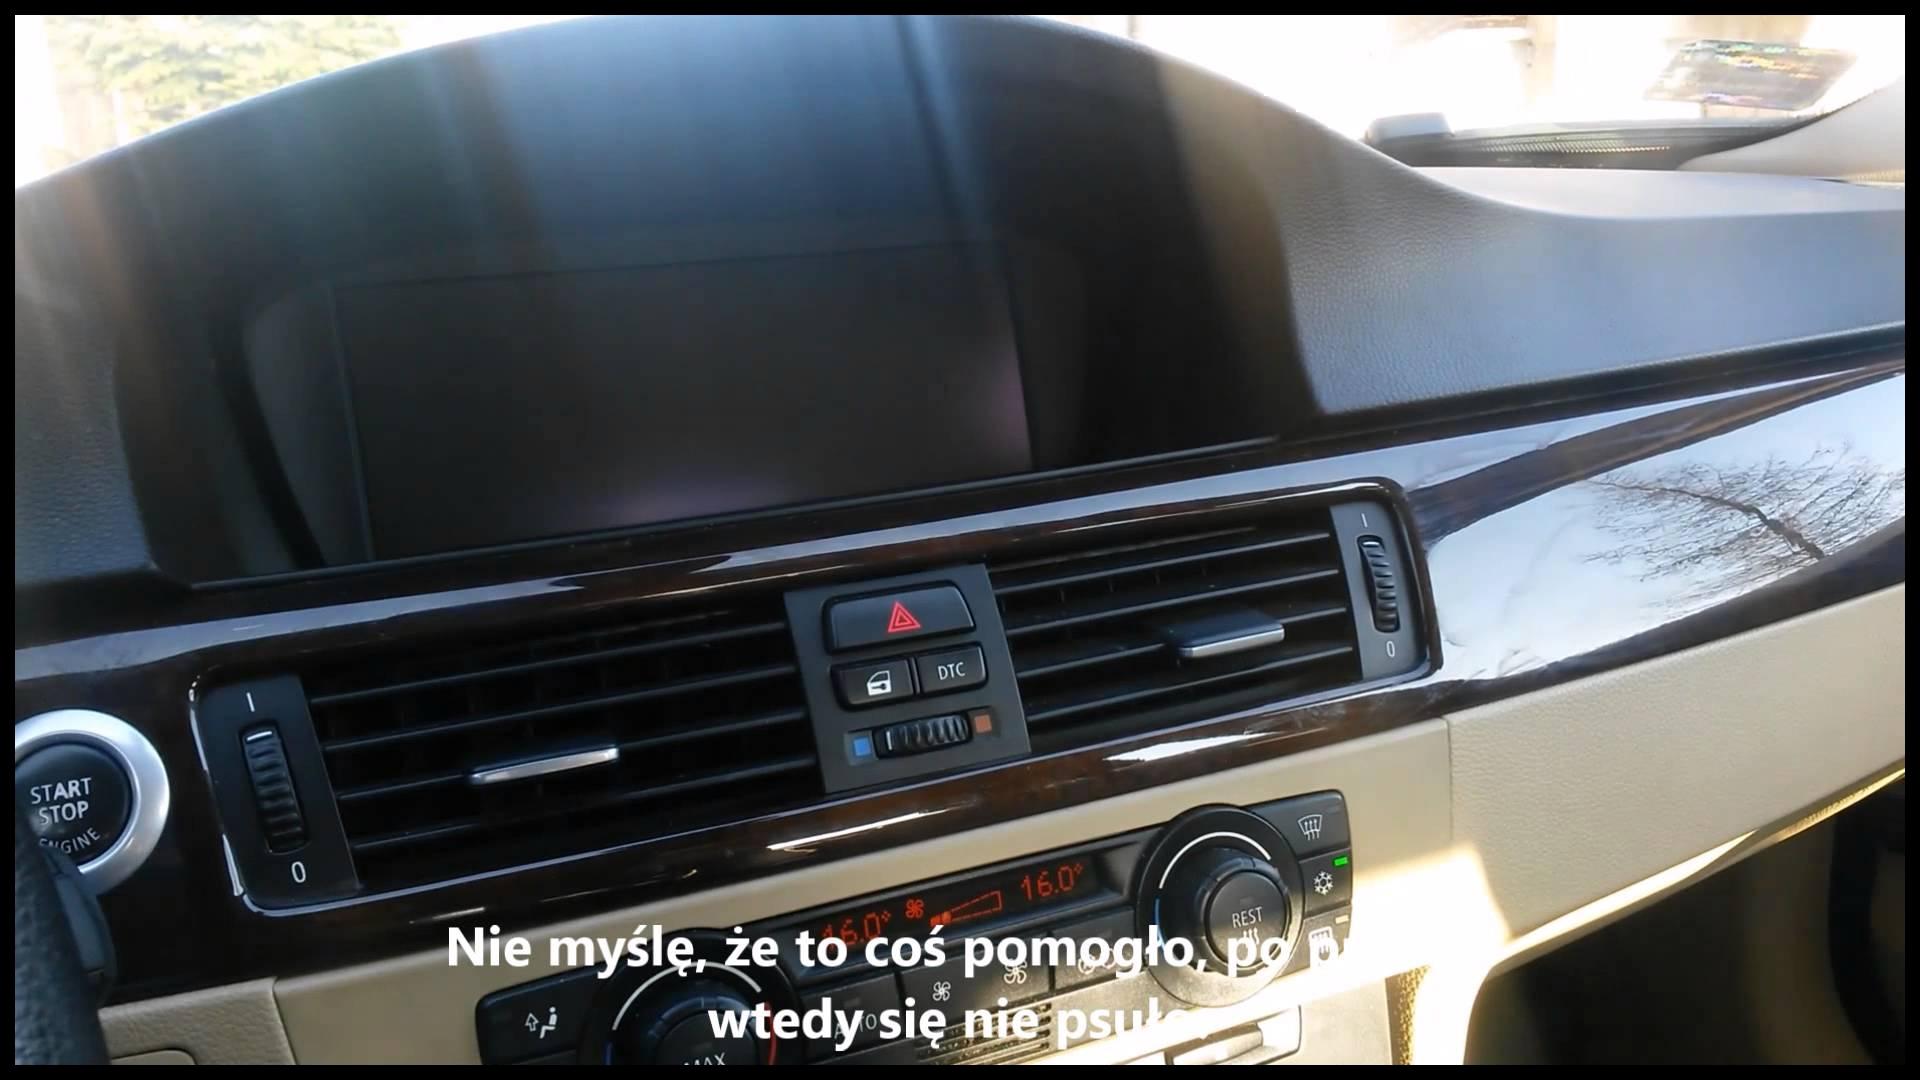 FIXED BMW CCC NAVIGATION SYSTEM keeps rebooting problem Radio restaruje się